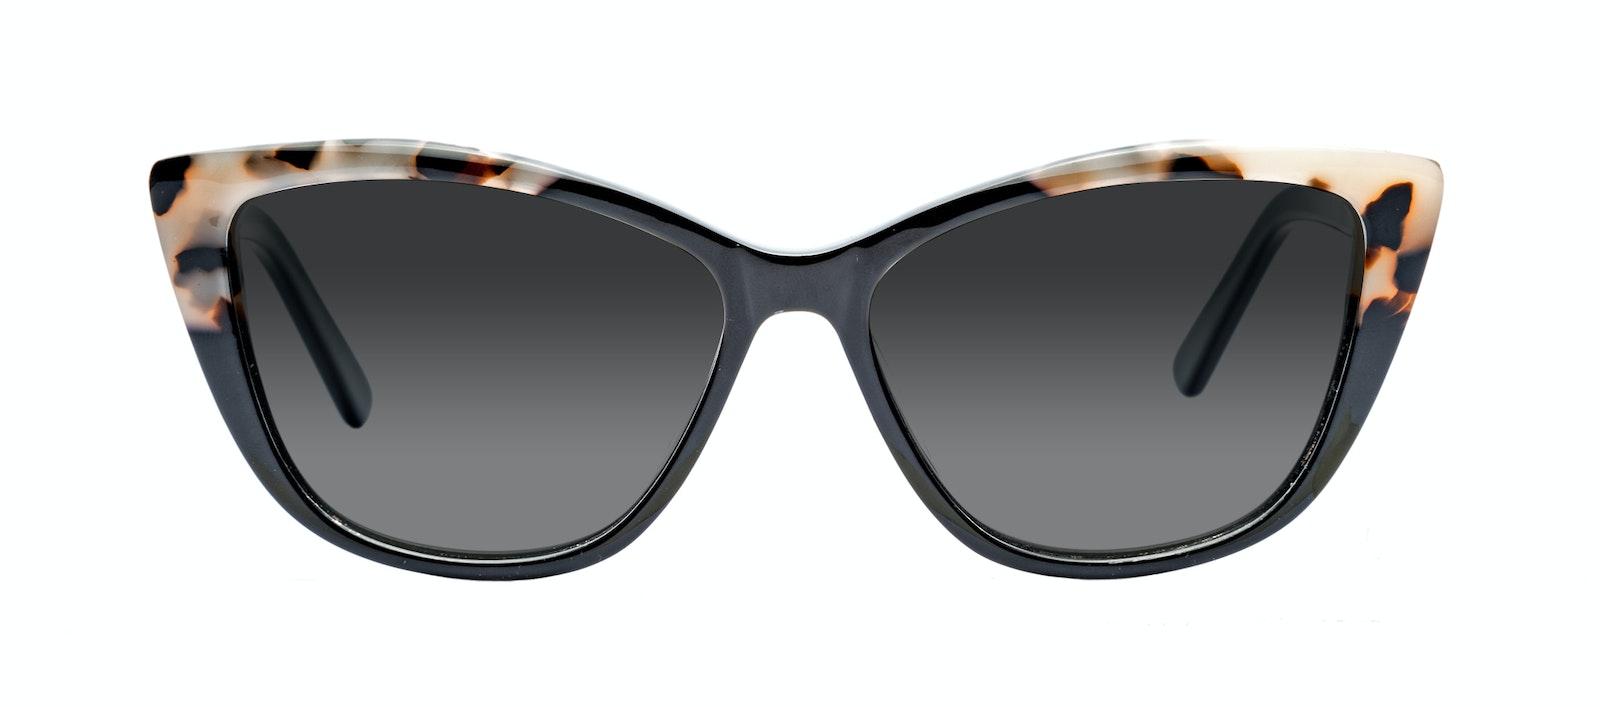 57f2dc10c30a Affordable Fashion Glasses Cat Eye Daring Cateye Sunglasses Women Dolled Up  Ebony Granite Front